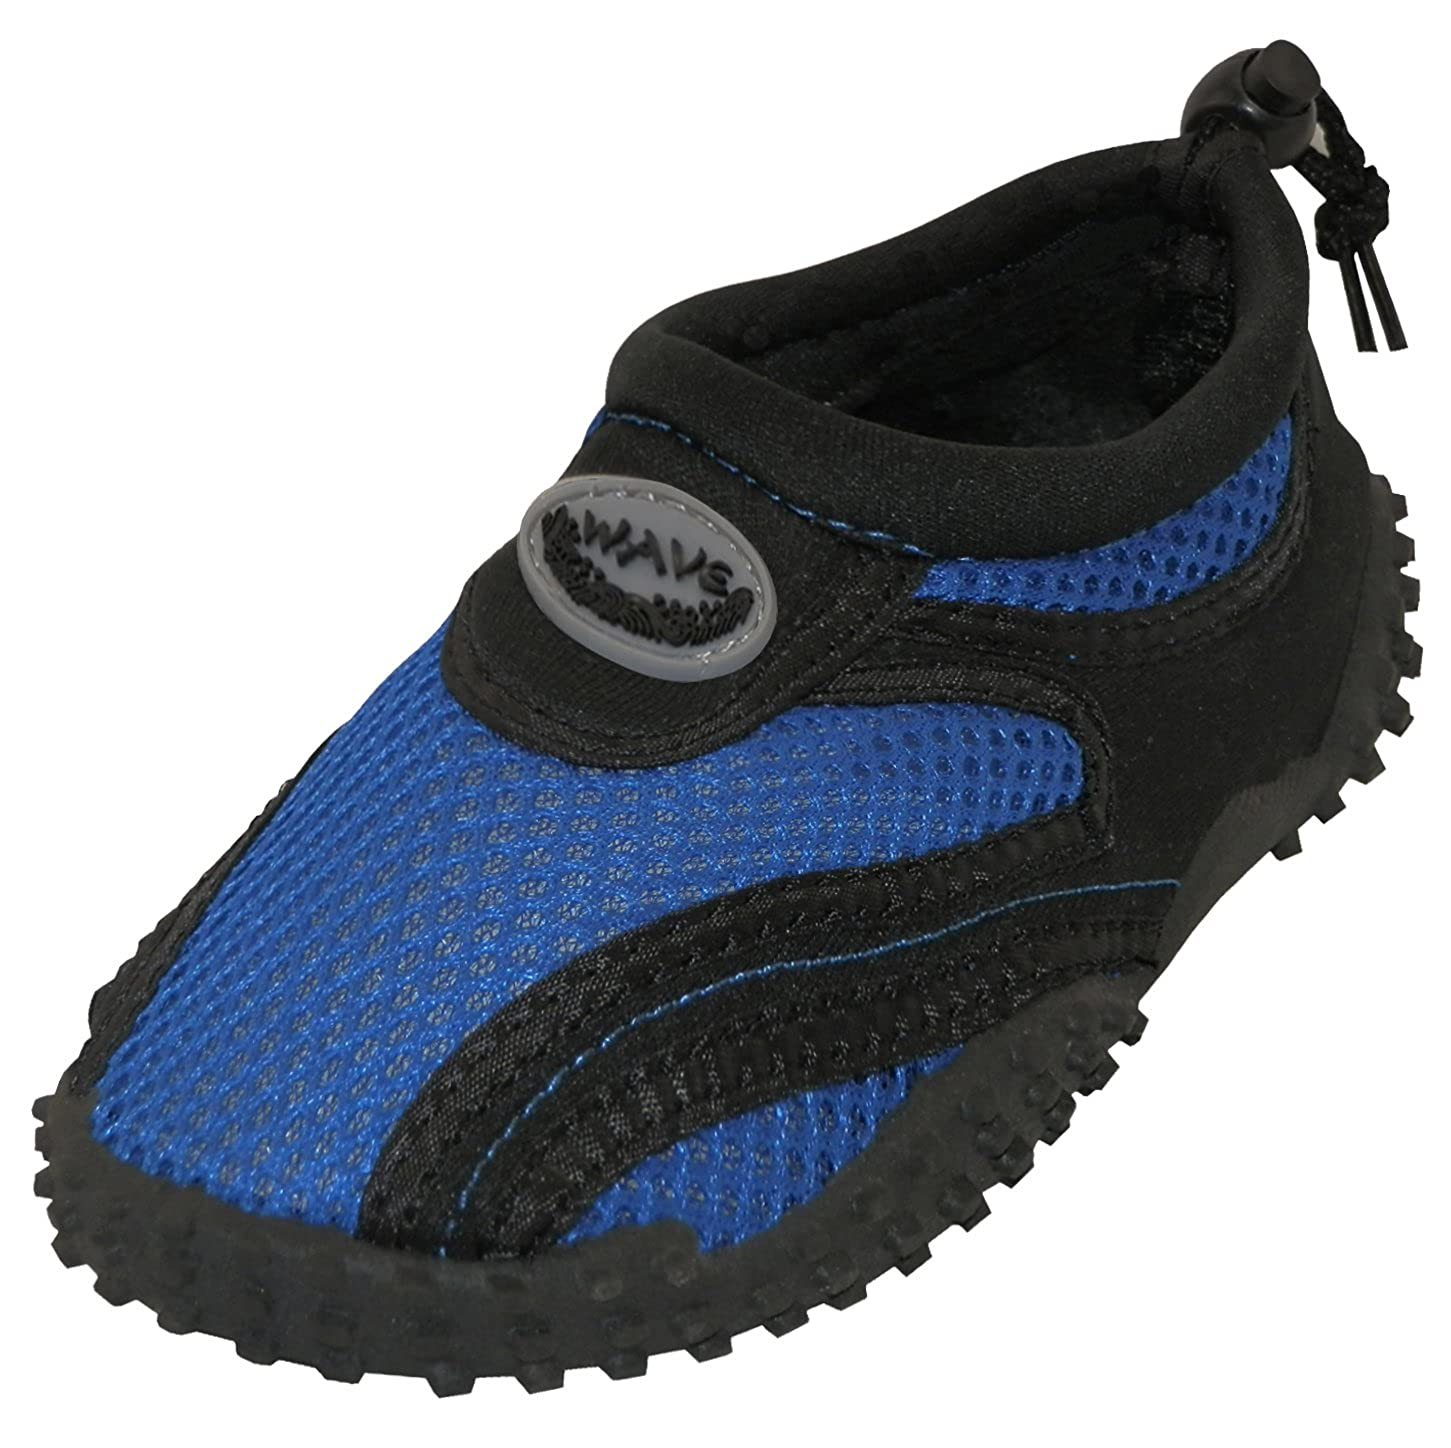 Cambridge Select Toddlers Quick Dry Slip-On Mesh Drawstring Non-Slip Water Shoe Toddler